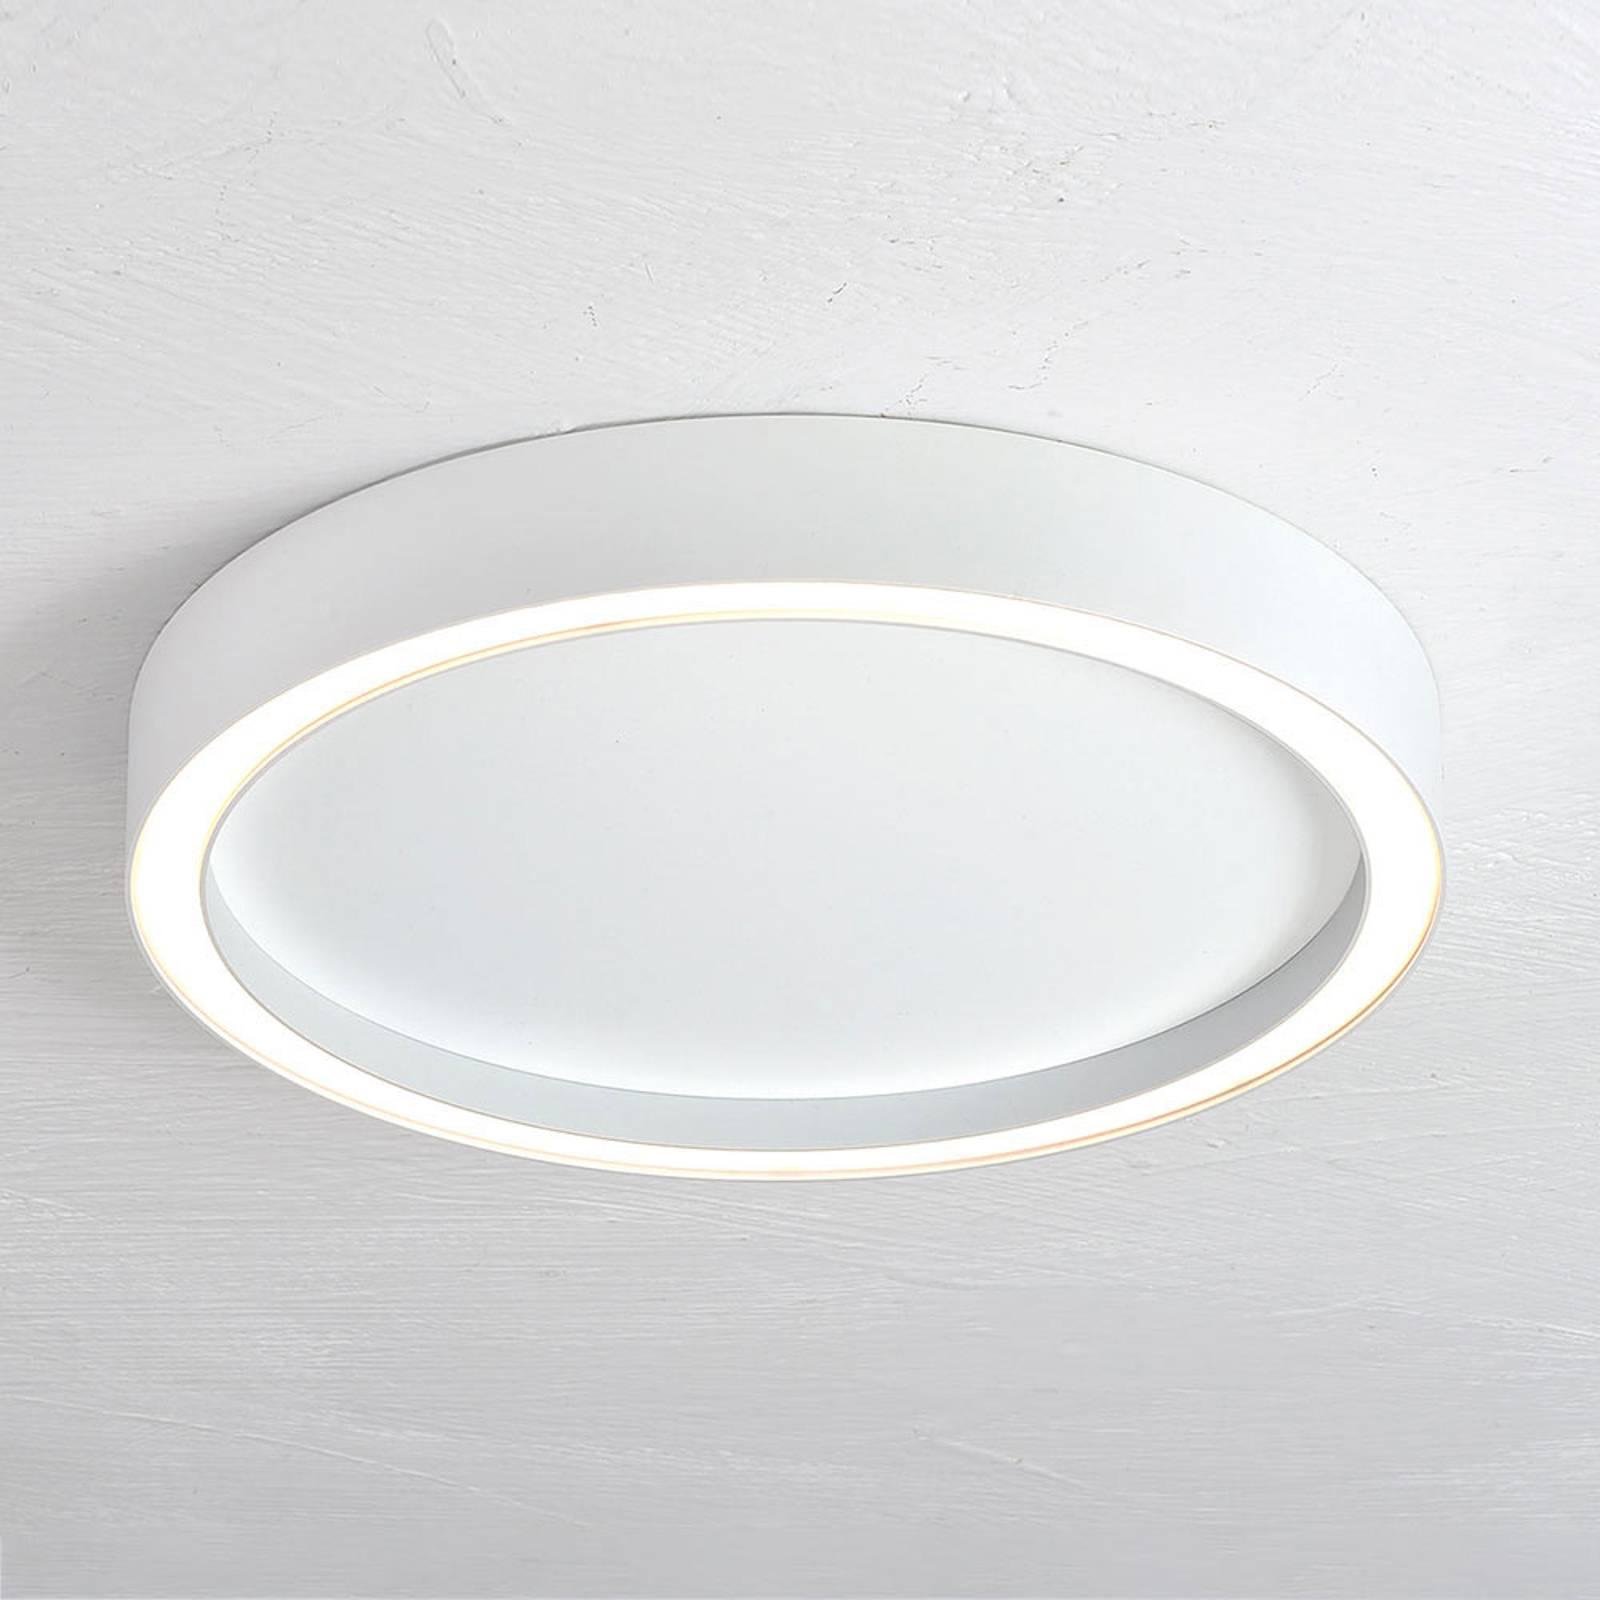 Bopp Aura LED plafondlamp Ø 55cm wit/wit